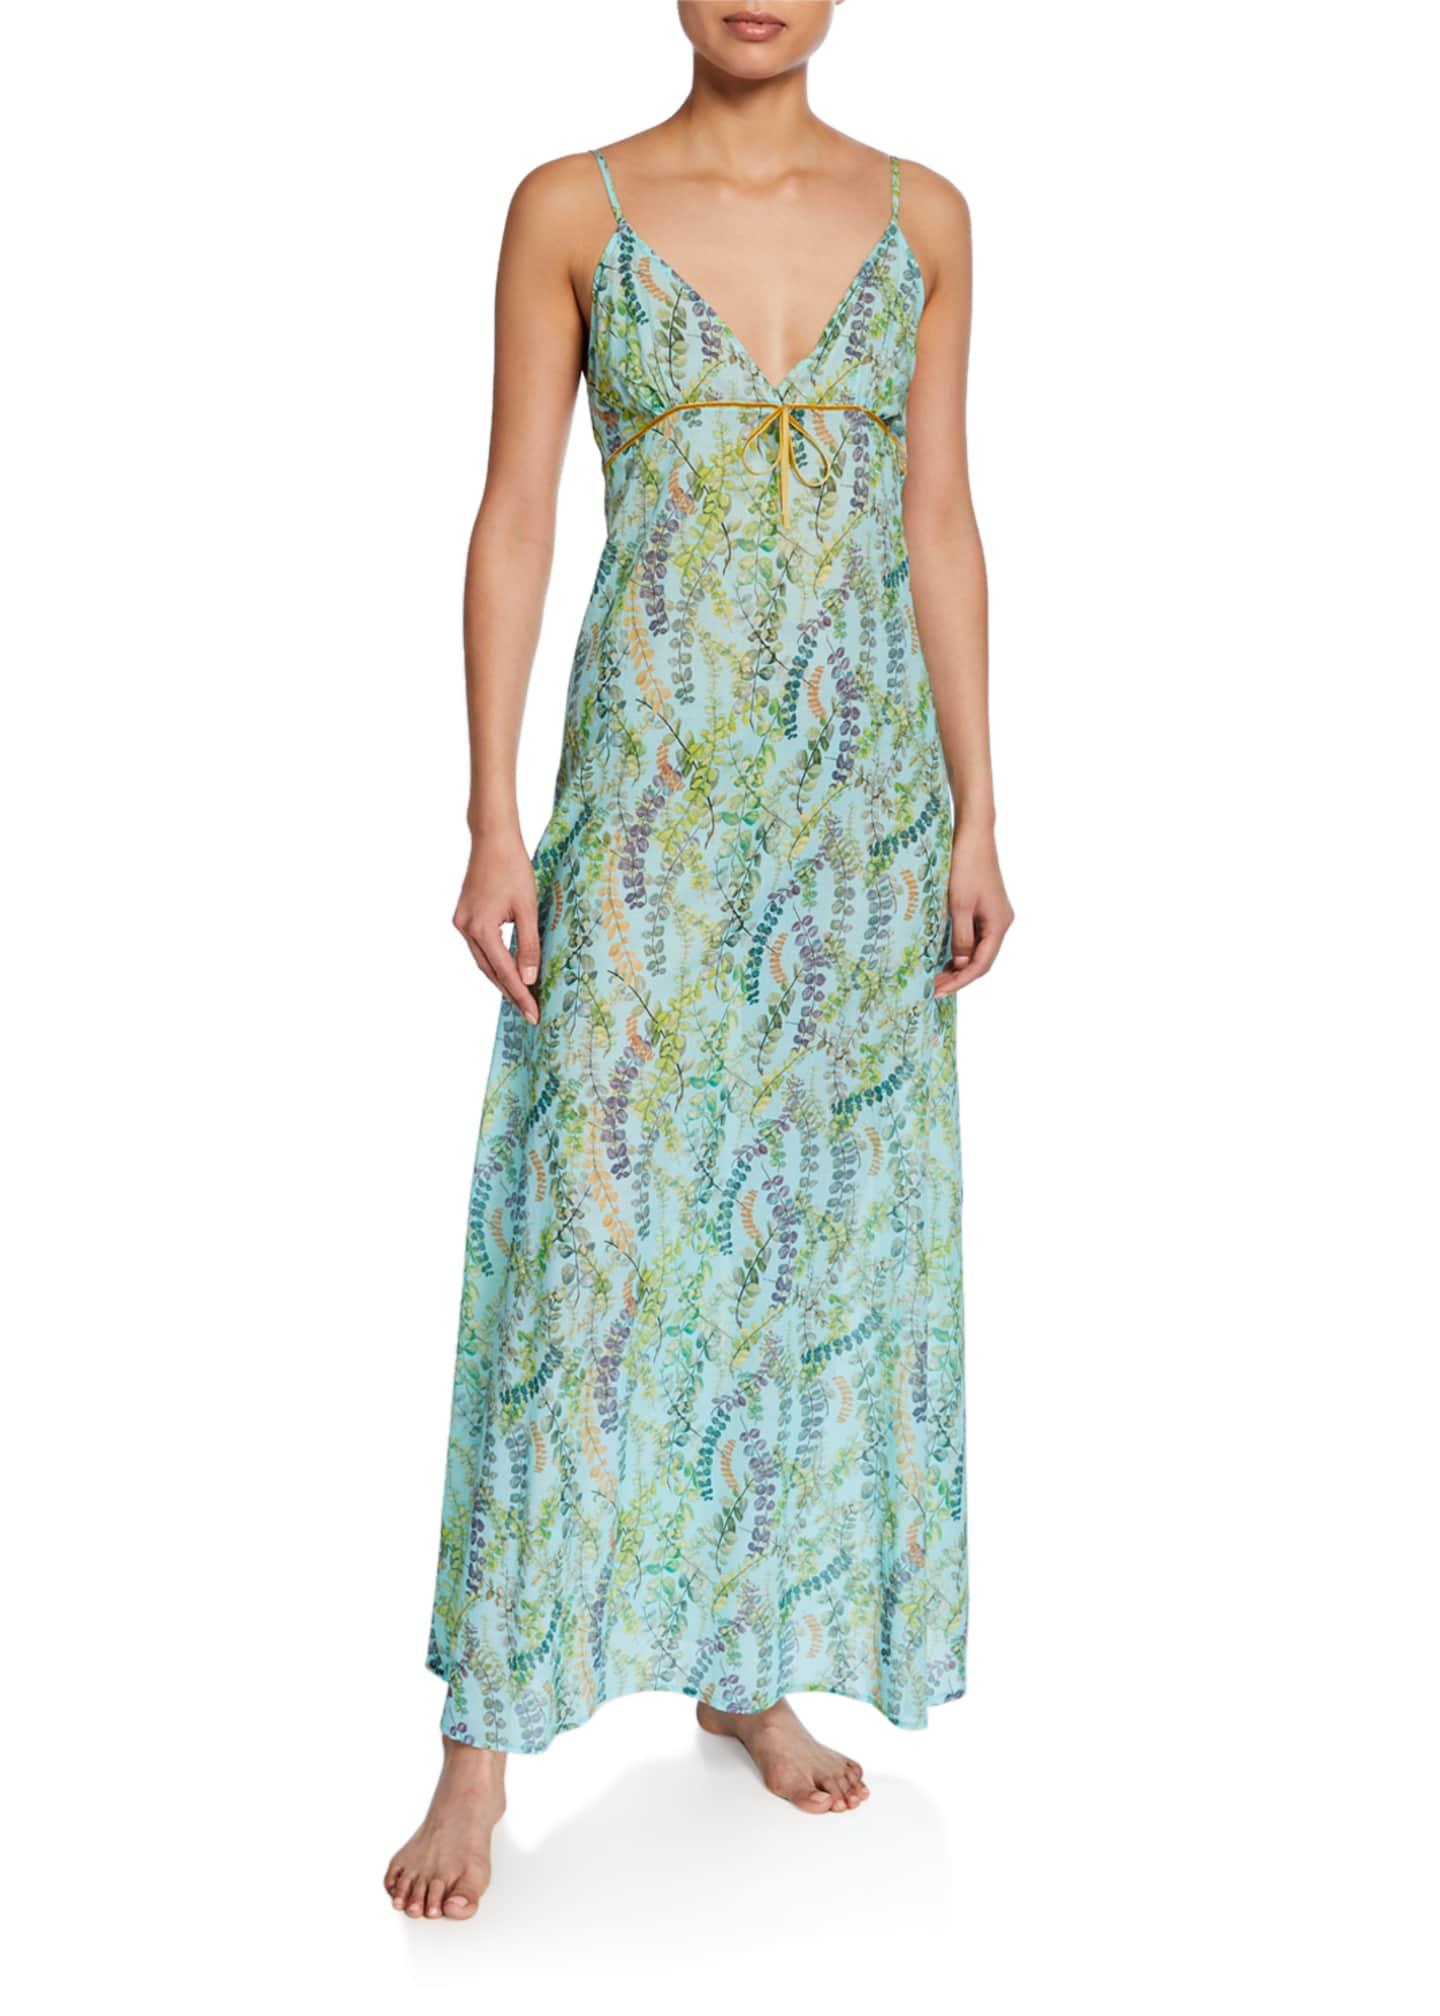 La Costa Del Algodon Severine Floral-Pattern Long Nightgown